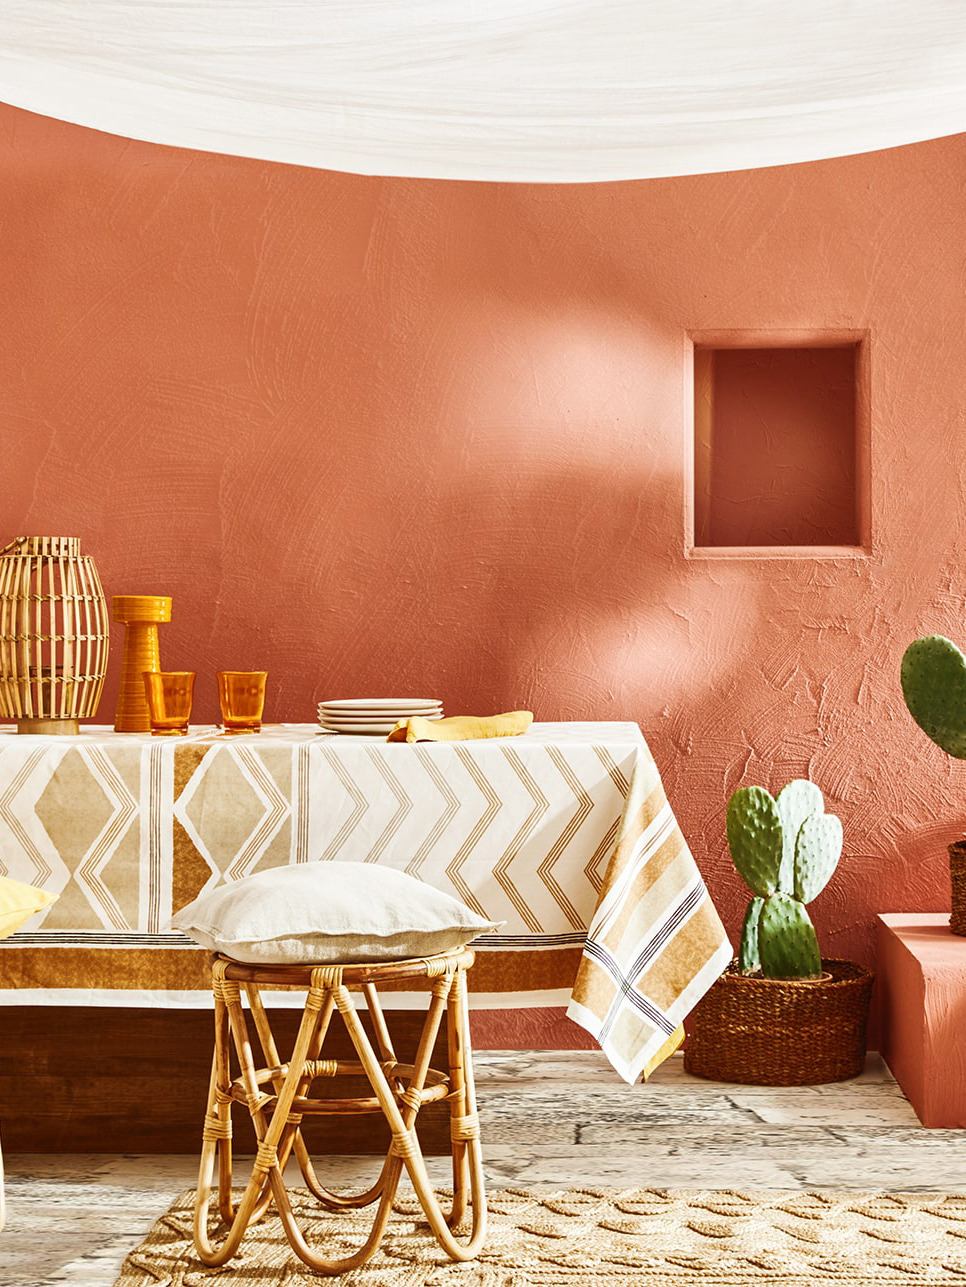 《Zara Home》2019春夏家居用品系列Lookbook